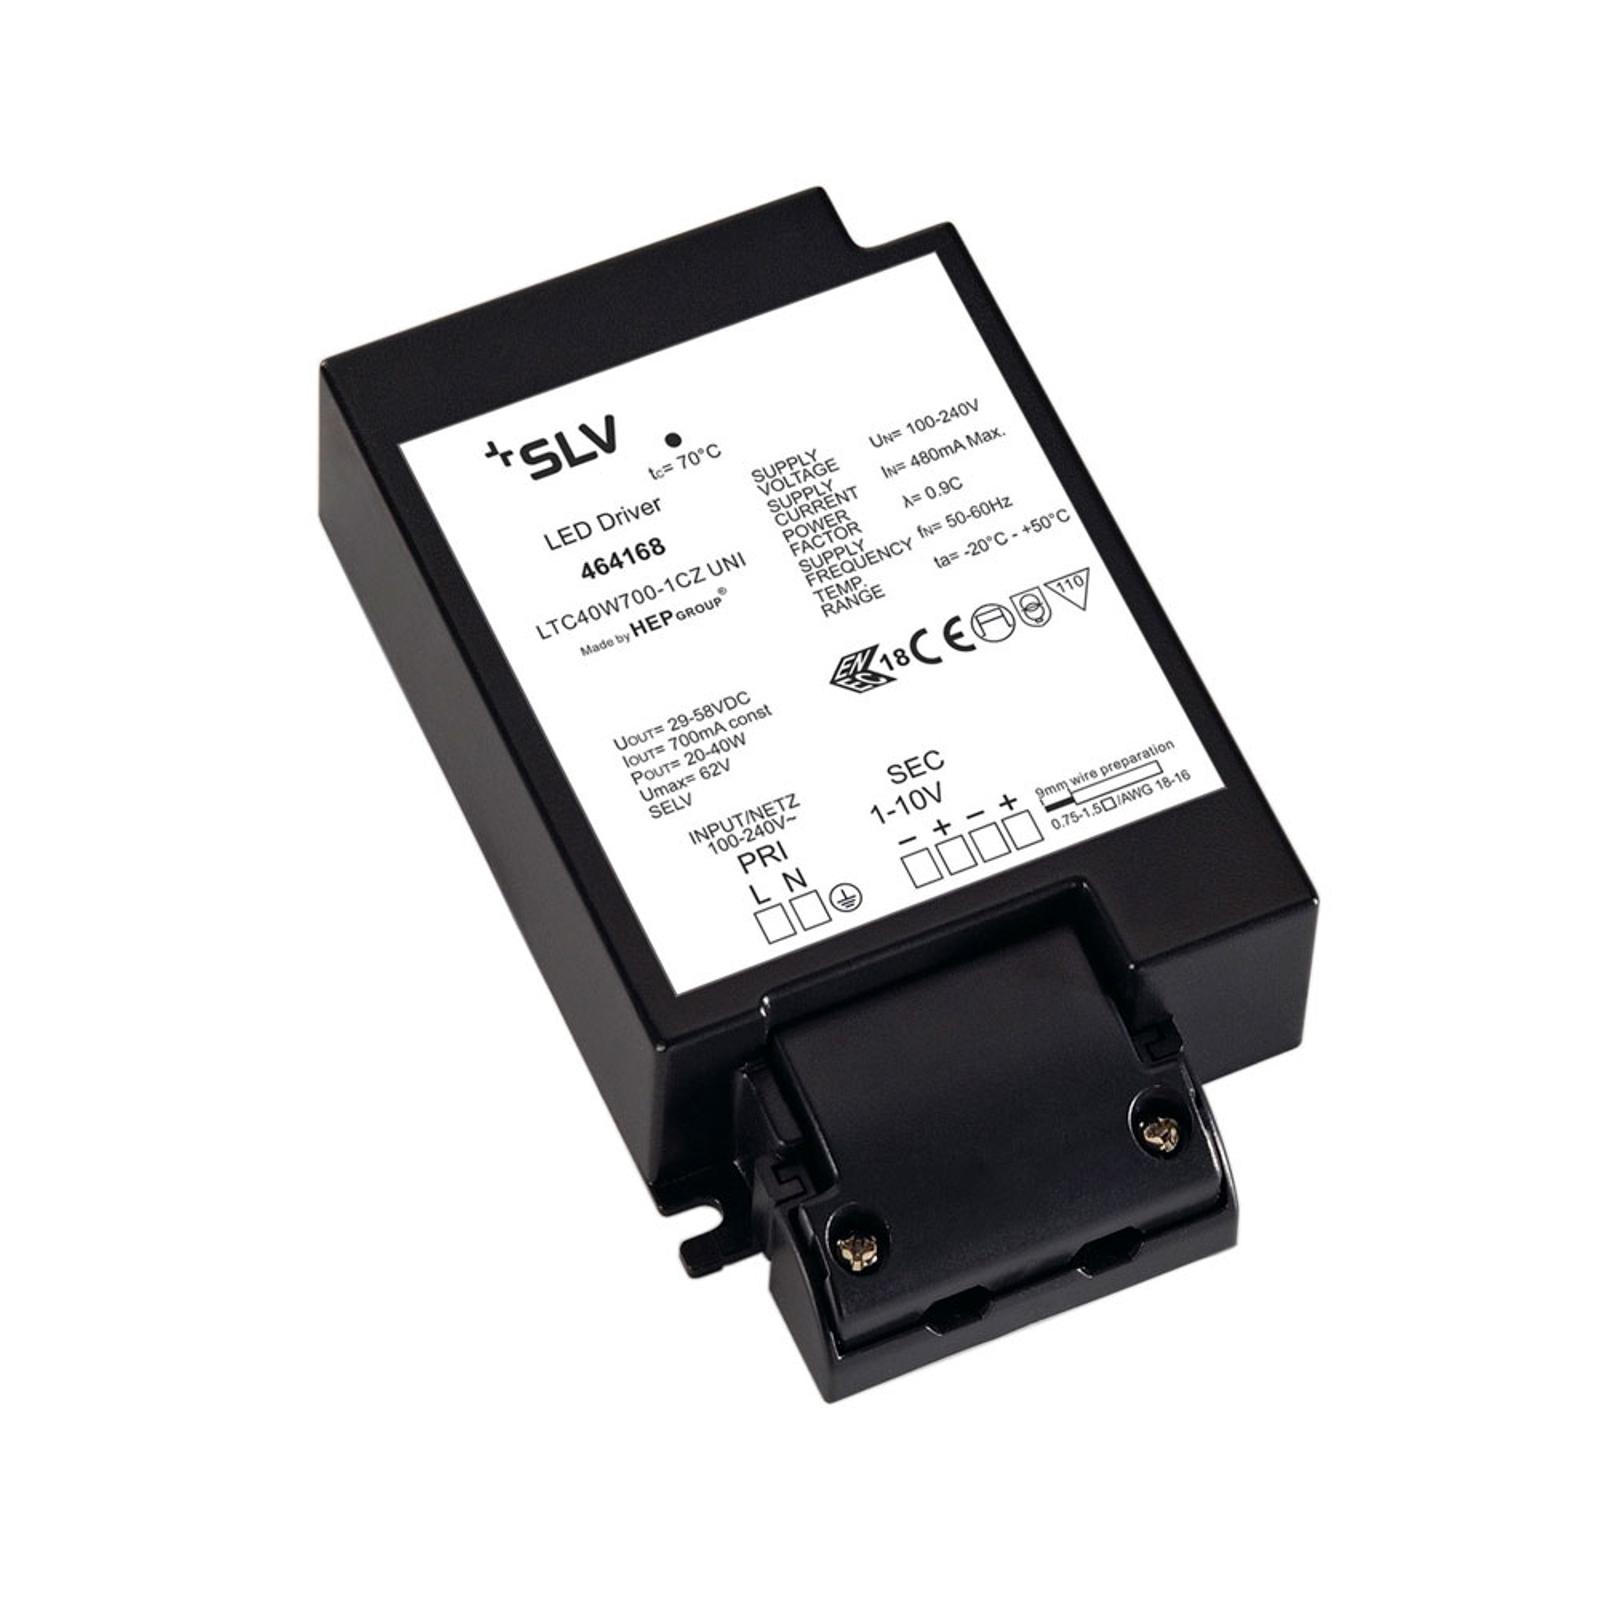 SLV LED-Treiber 700 mA/40W mit Zugentlastung